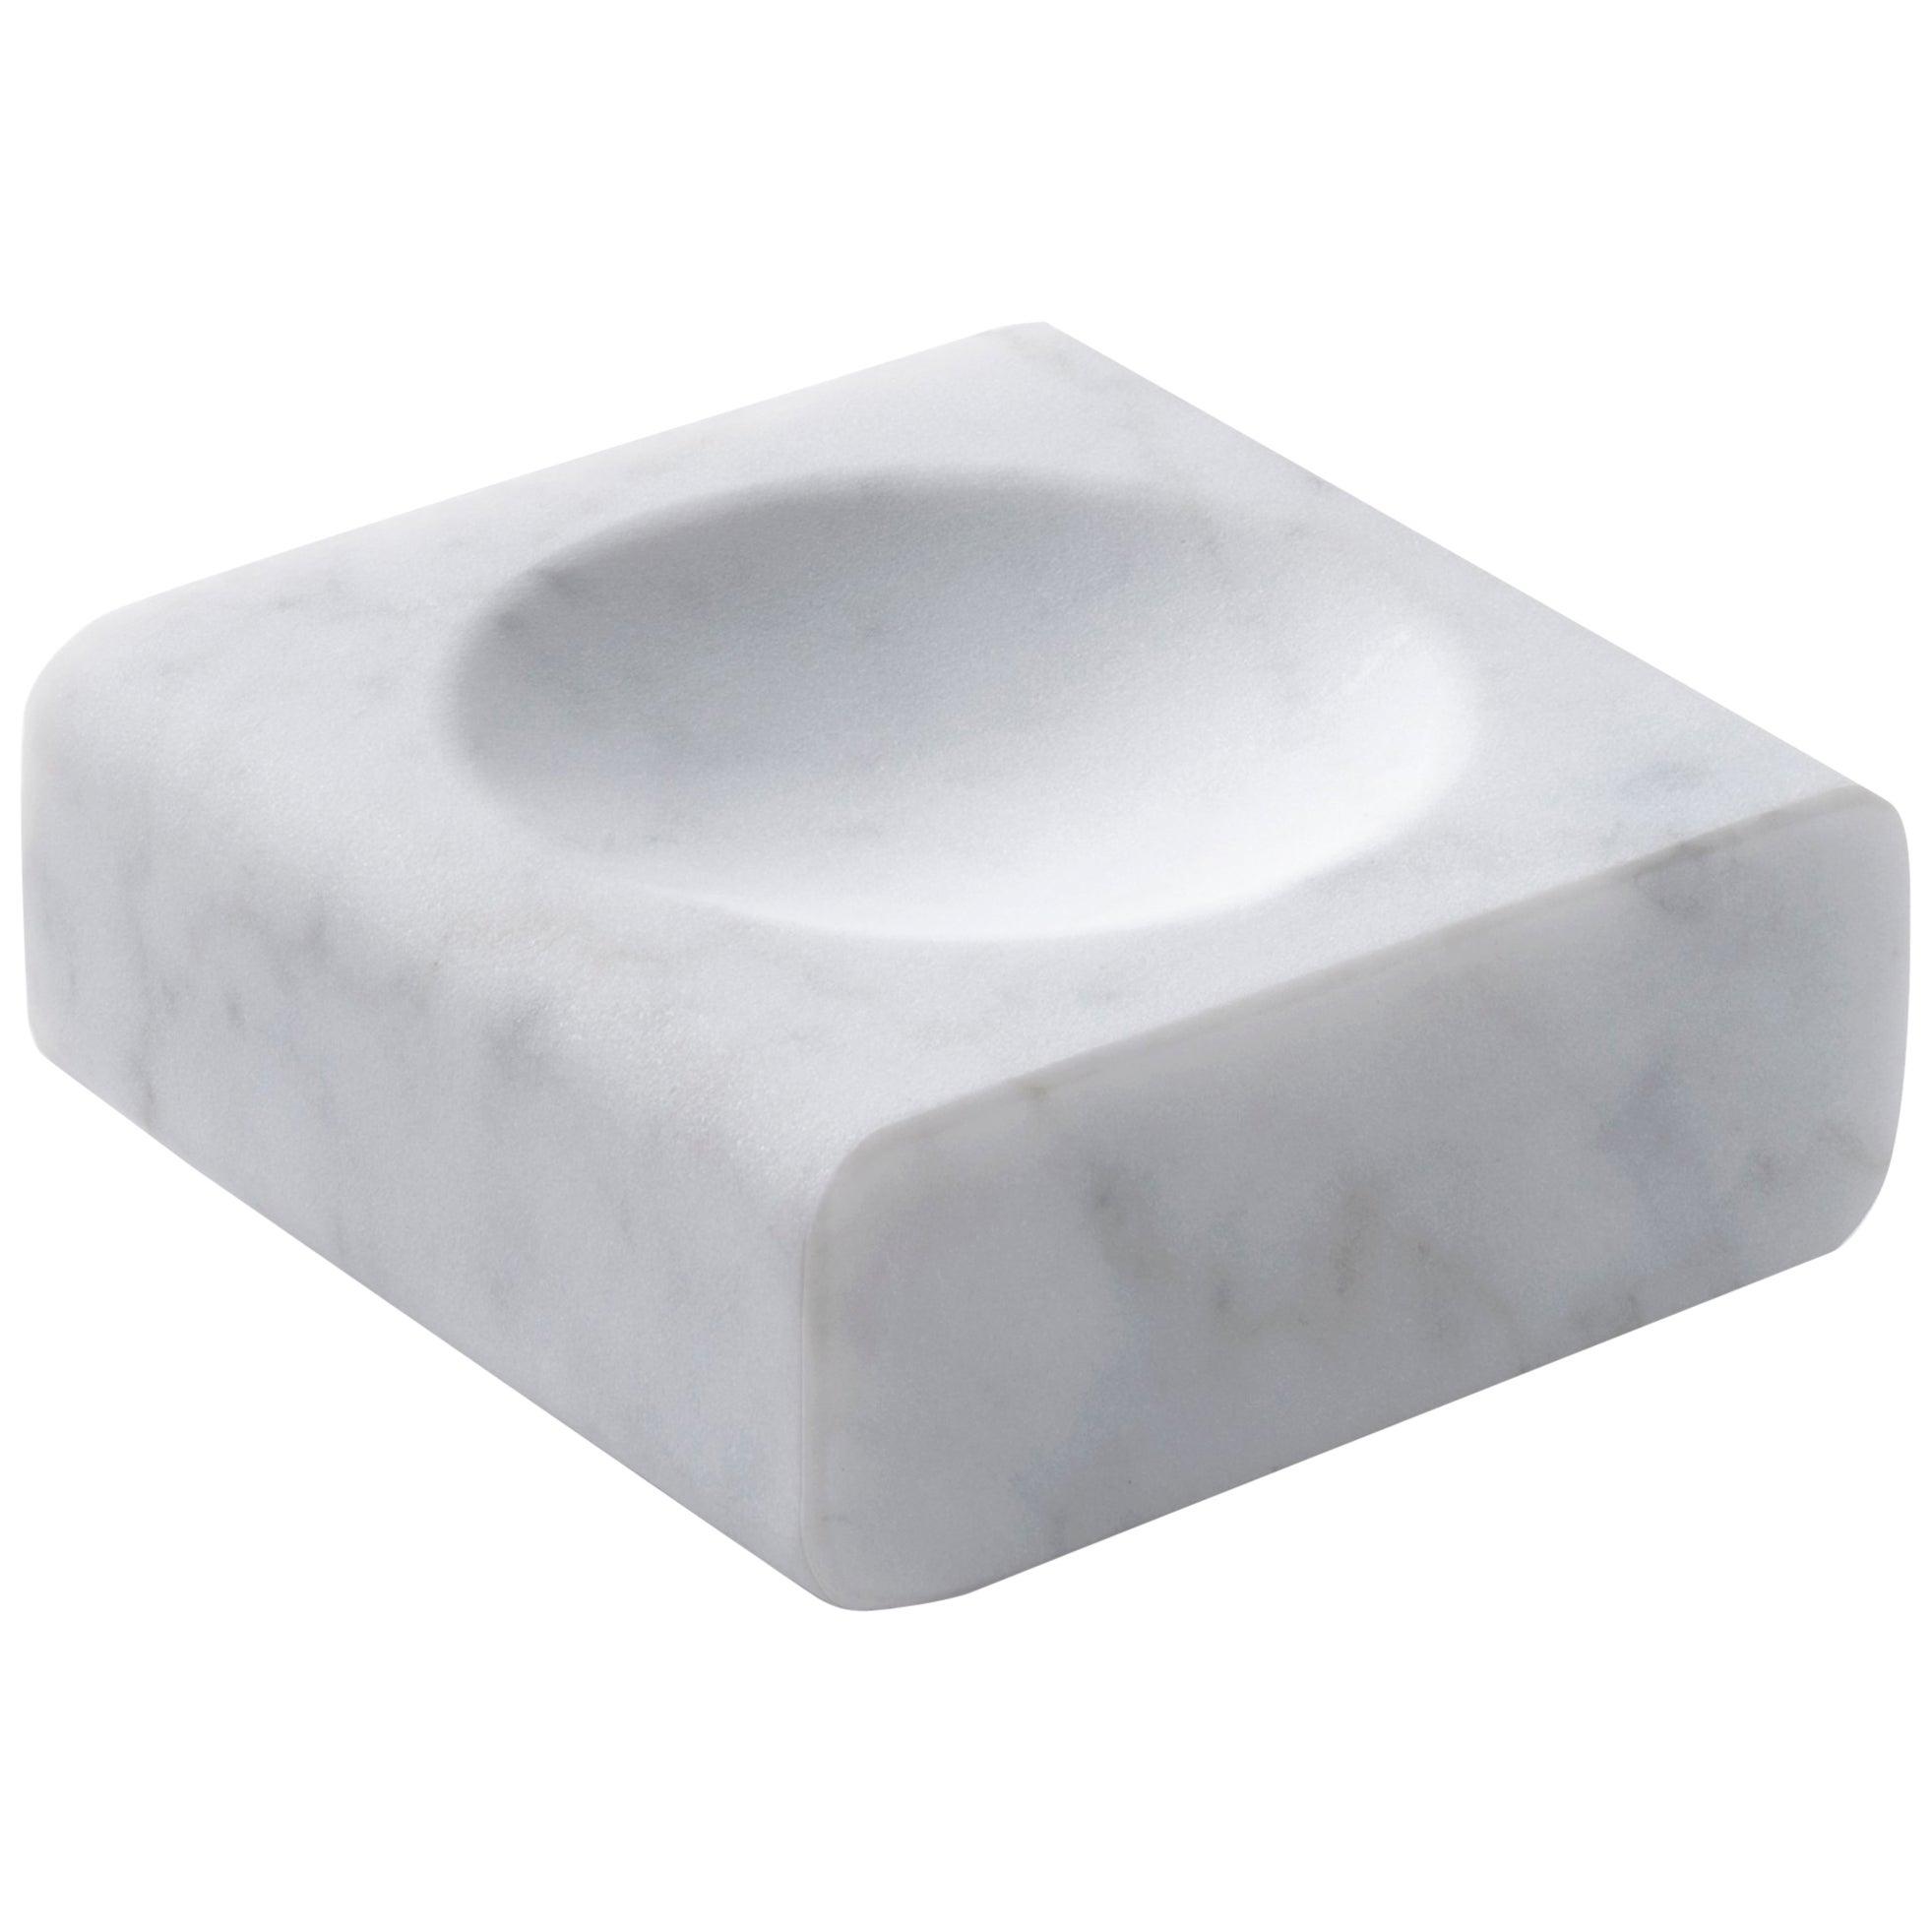 Salvatori Pillow Dish Tray In Bianco Carrara Marble By John